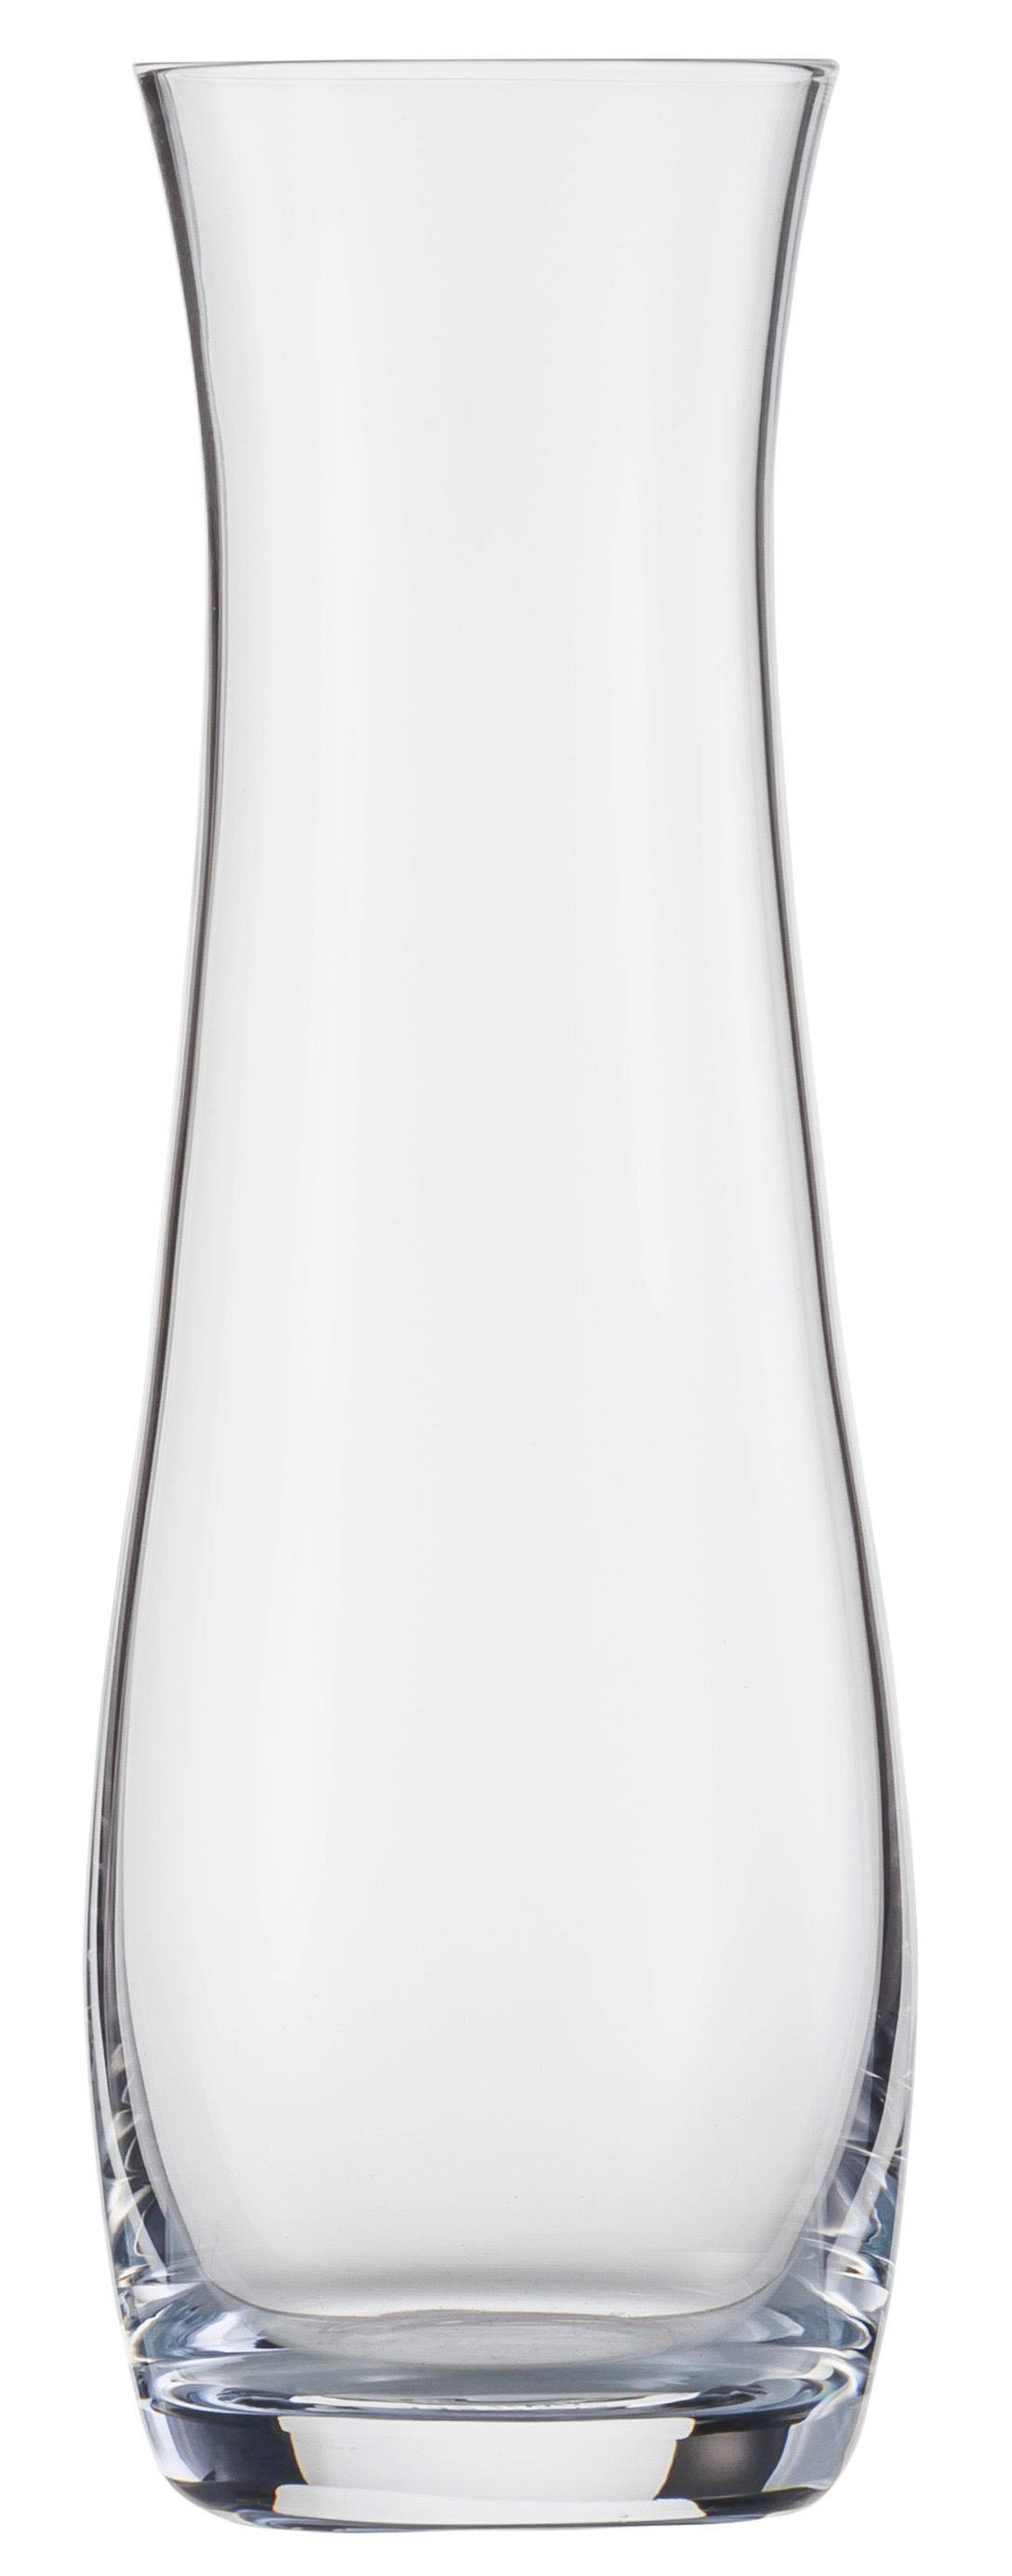 KARAFFE 0,2 L - Klar, Basics, Glas (6,4/18,5cm) - SCHOTT ZWIESEL